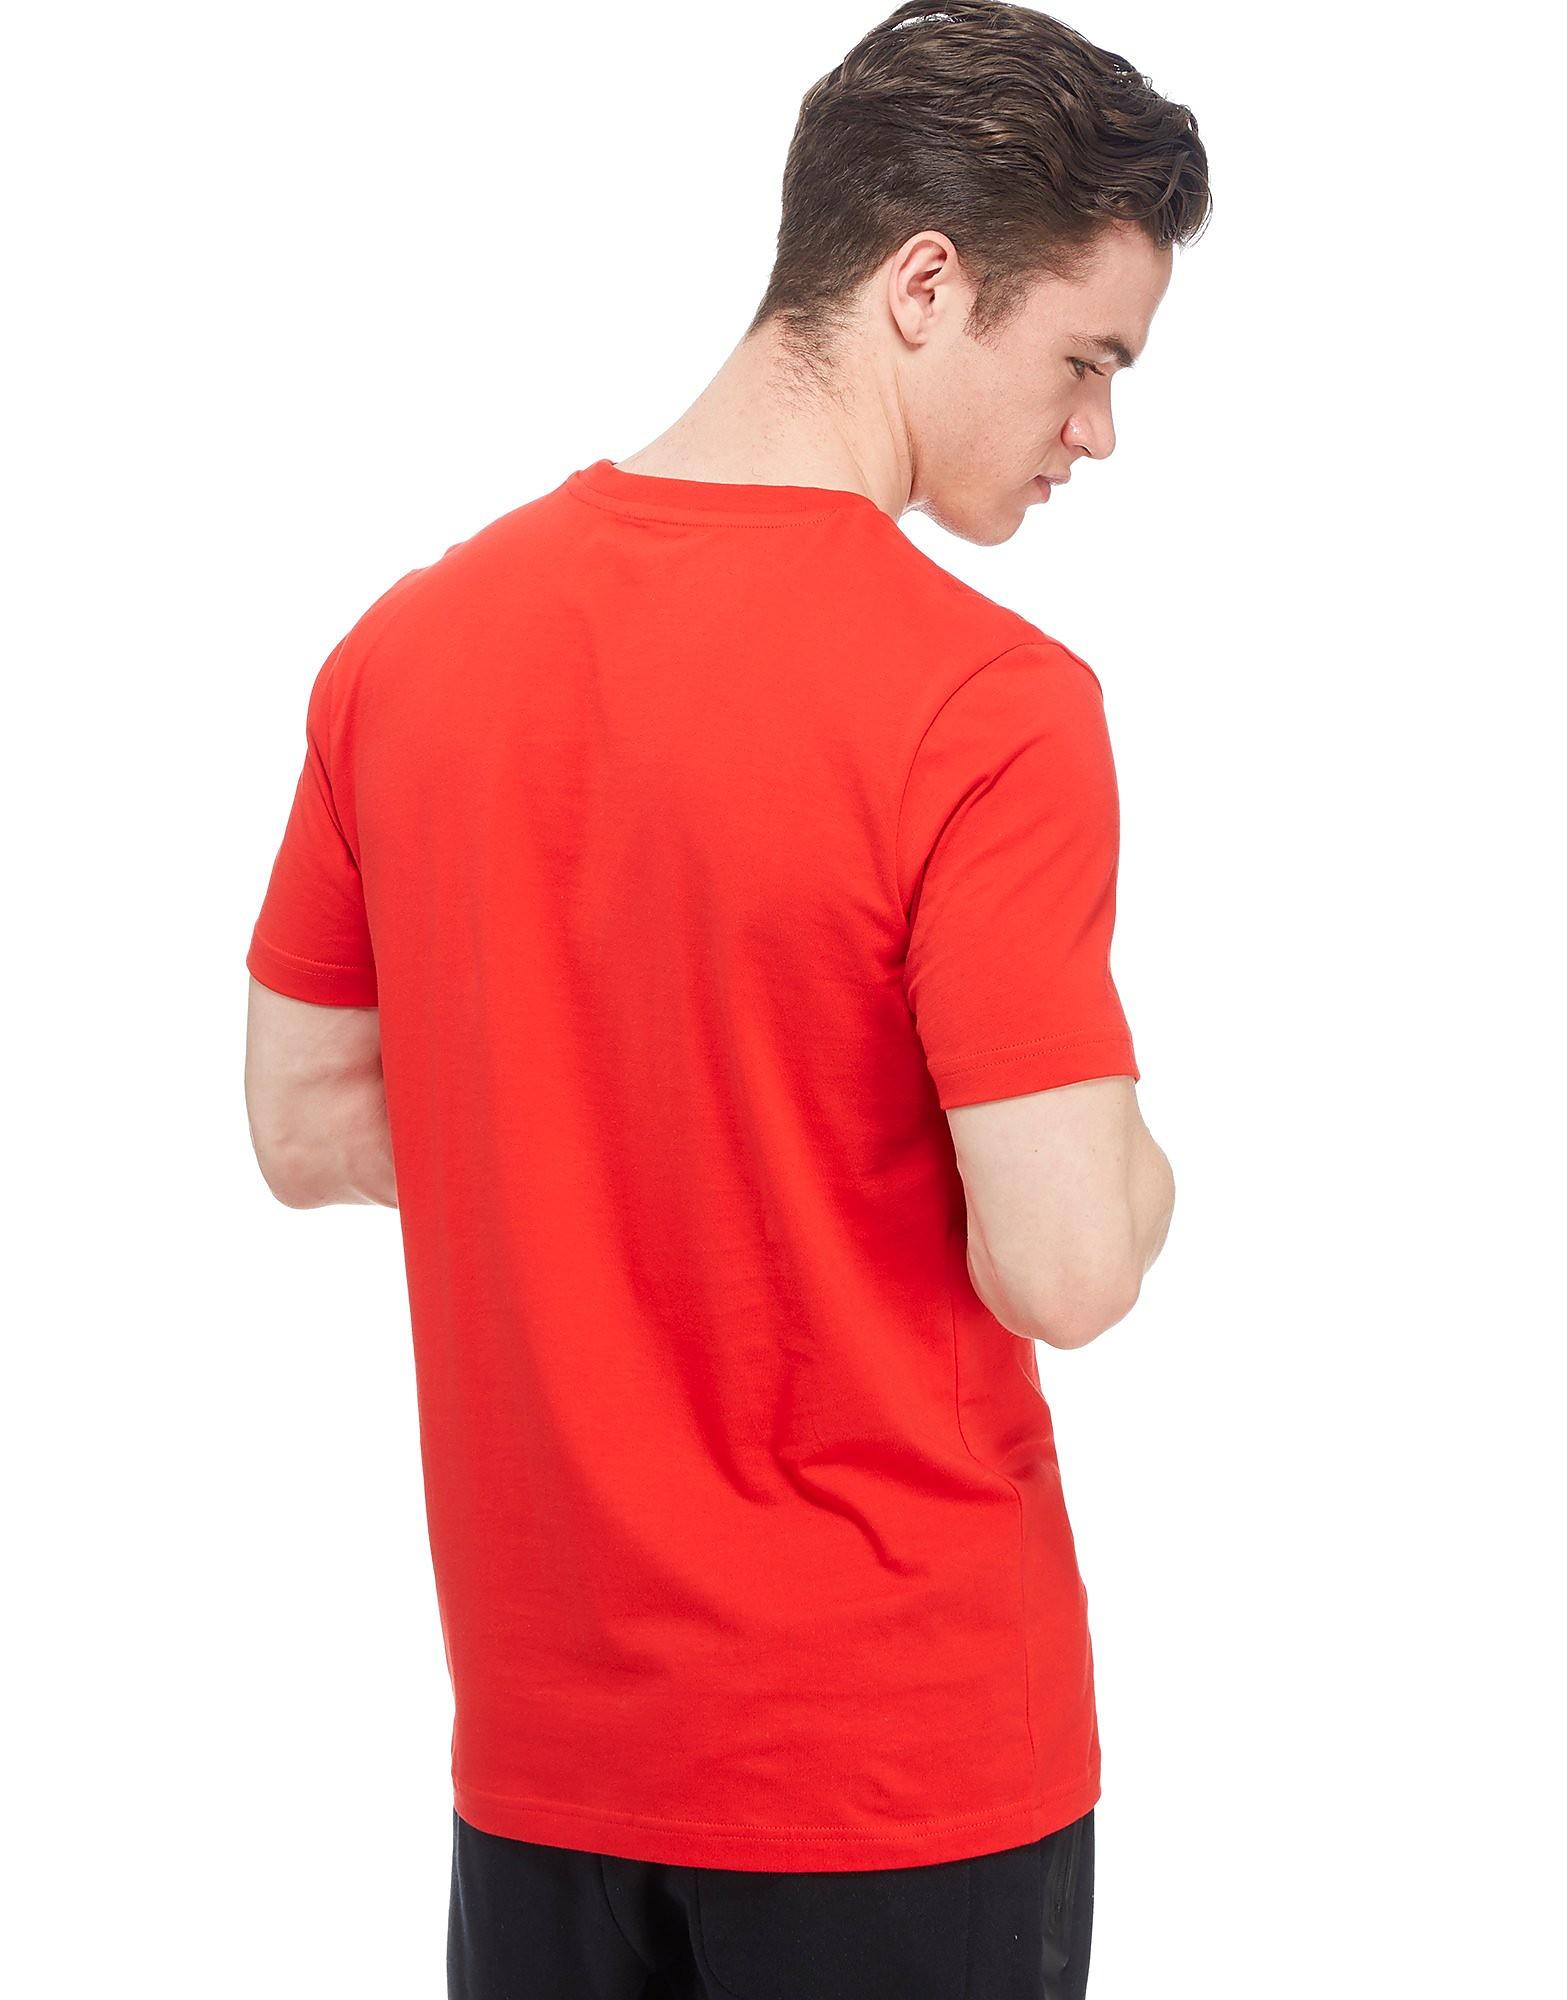 PUMA Wording T-Shirt